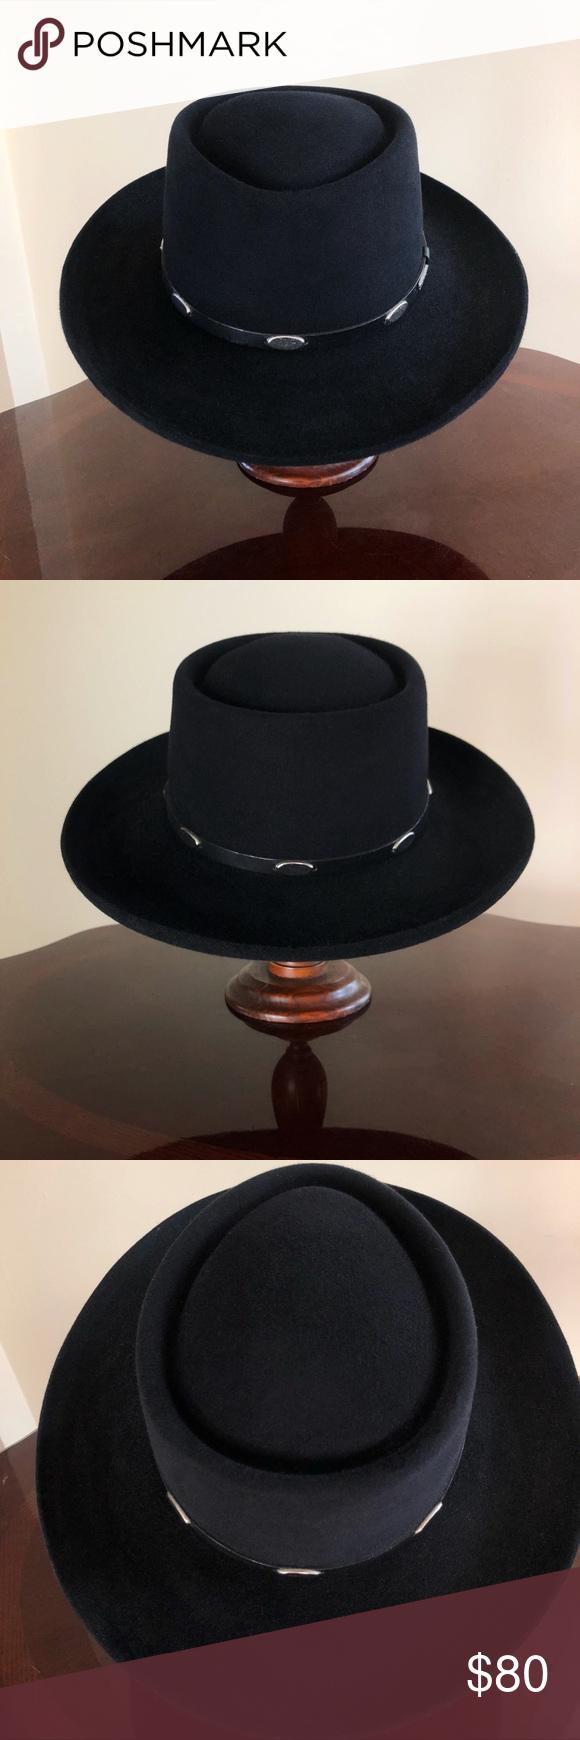 Royal Flush by Stetson Hats The Gun Club Collection ae3566a4426